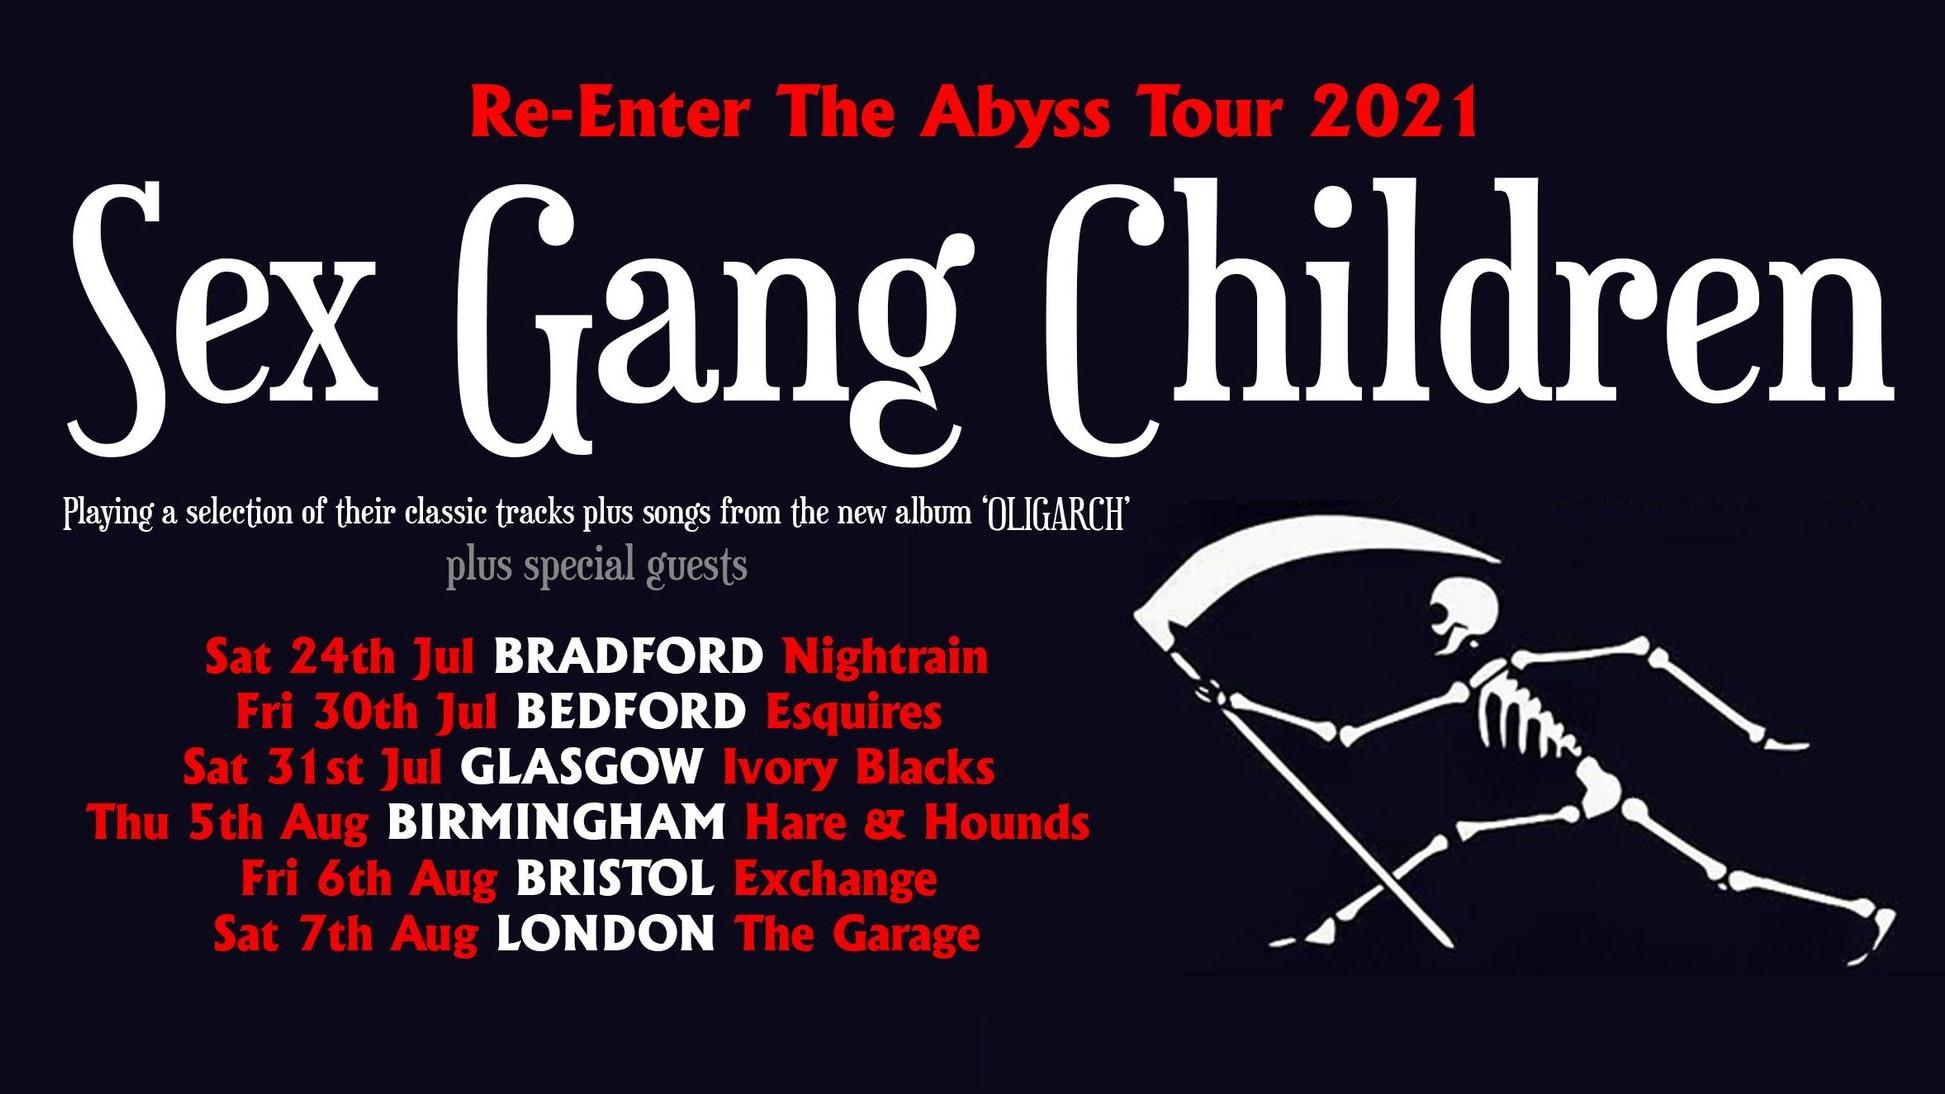 Sex Gang Children Re-Enter The Abyss Tour 2021 – Birmingham